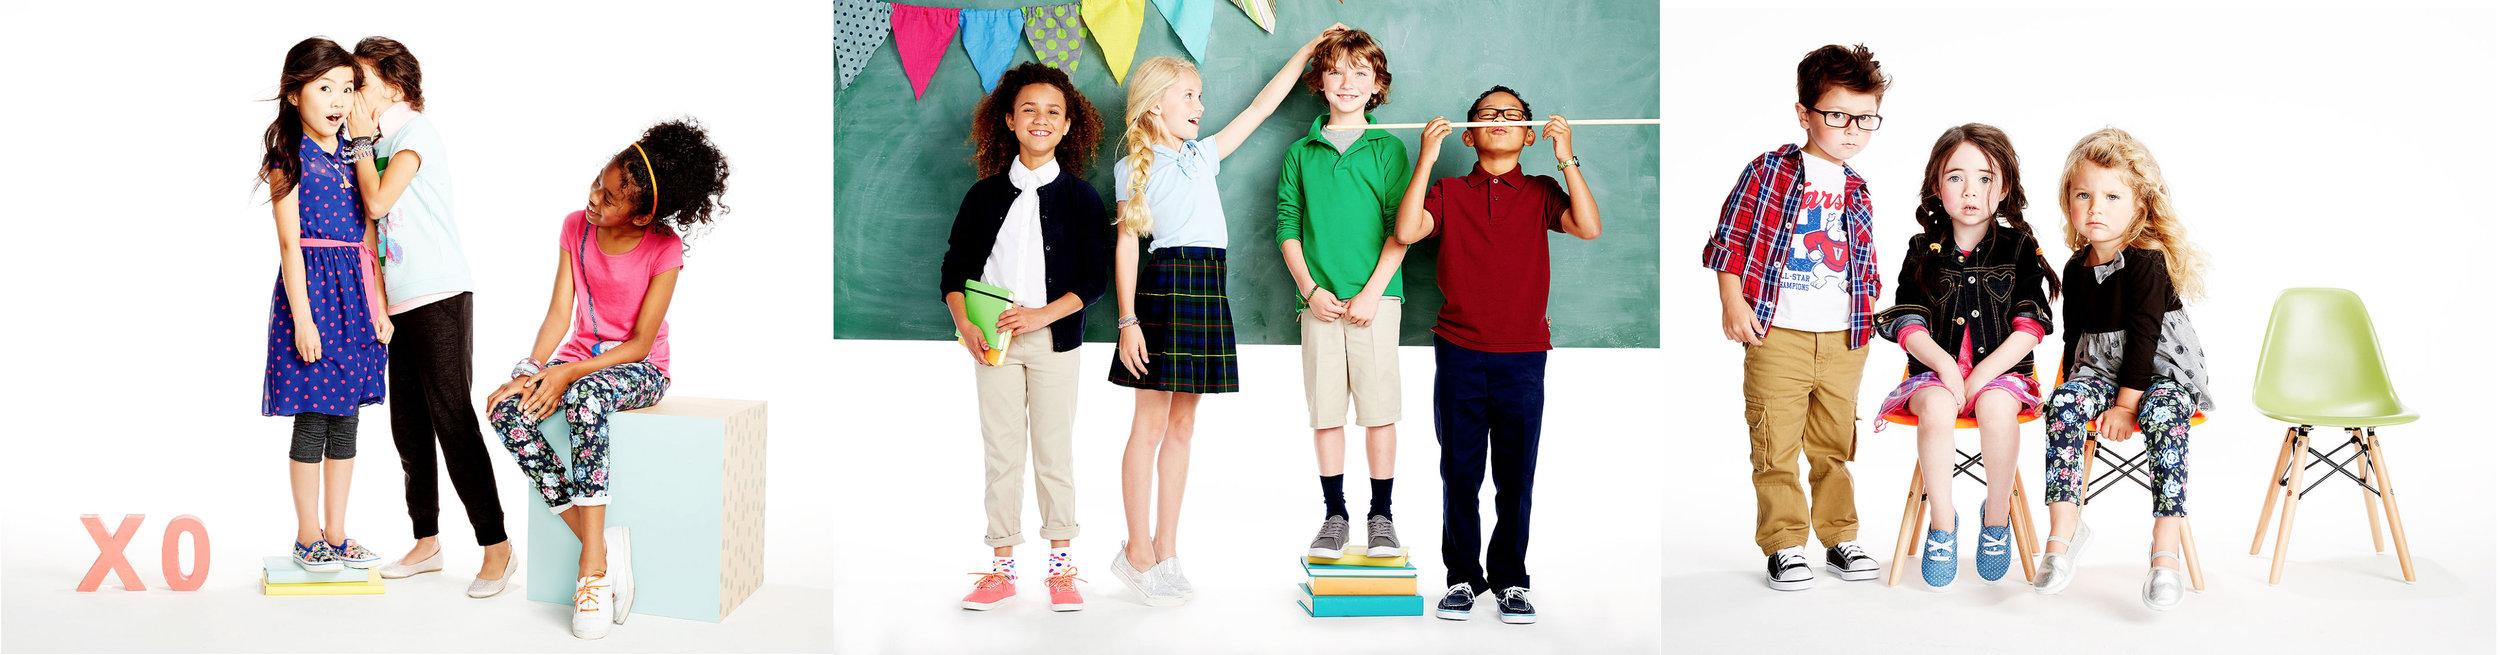 WALMART | BACK TO SCHOOL